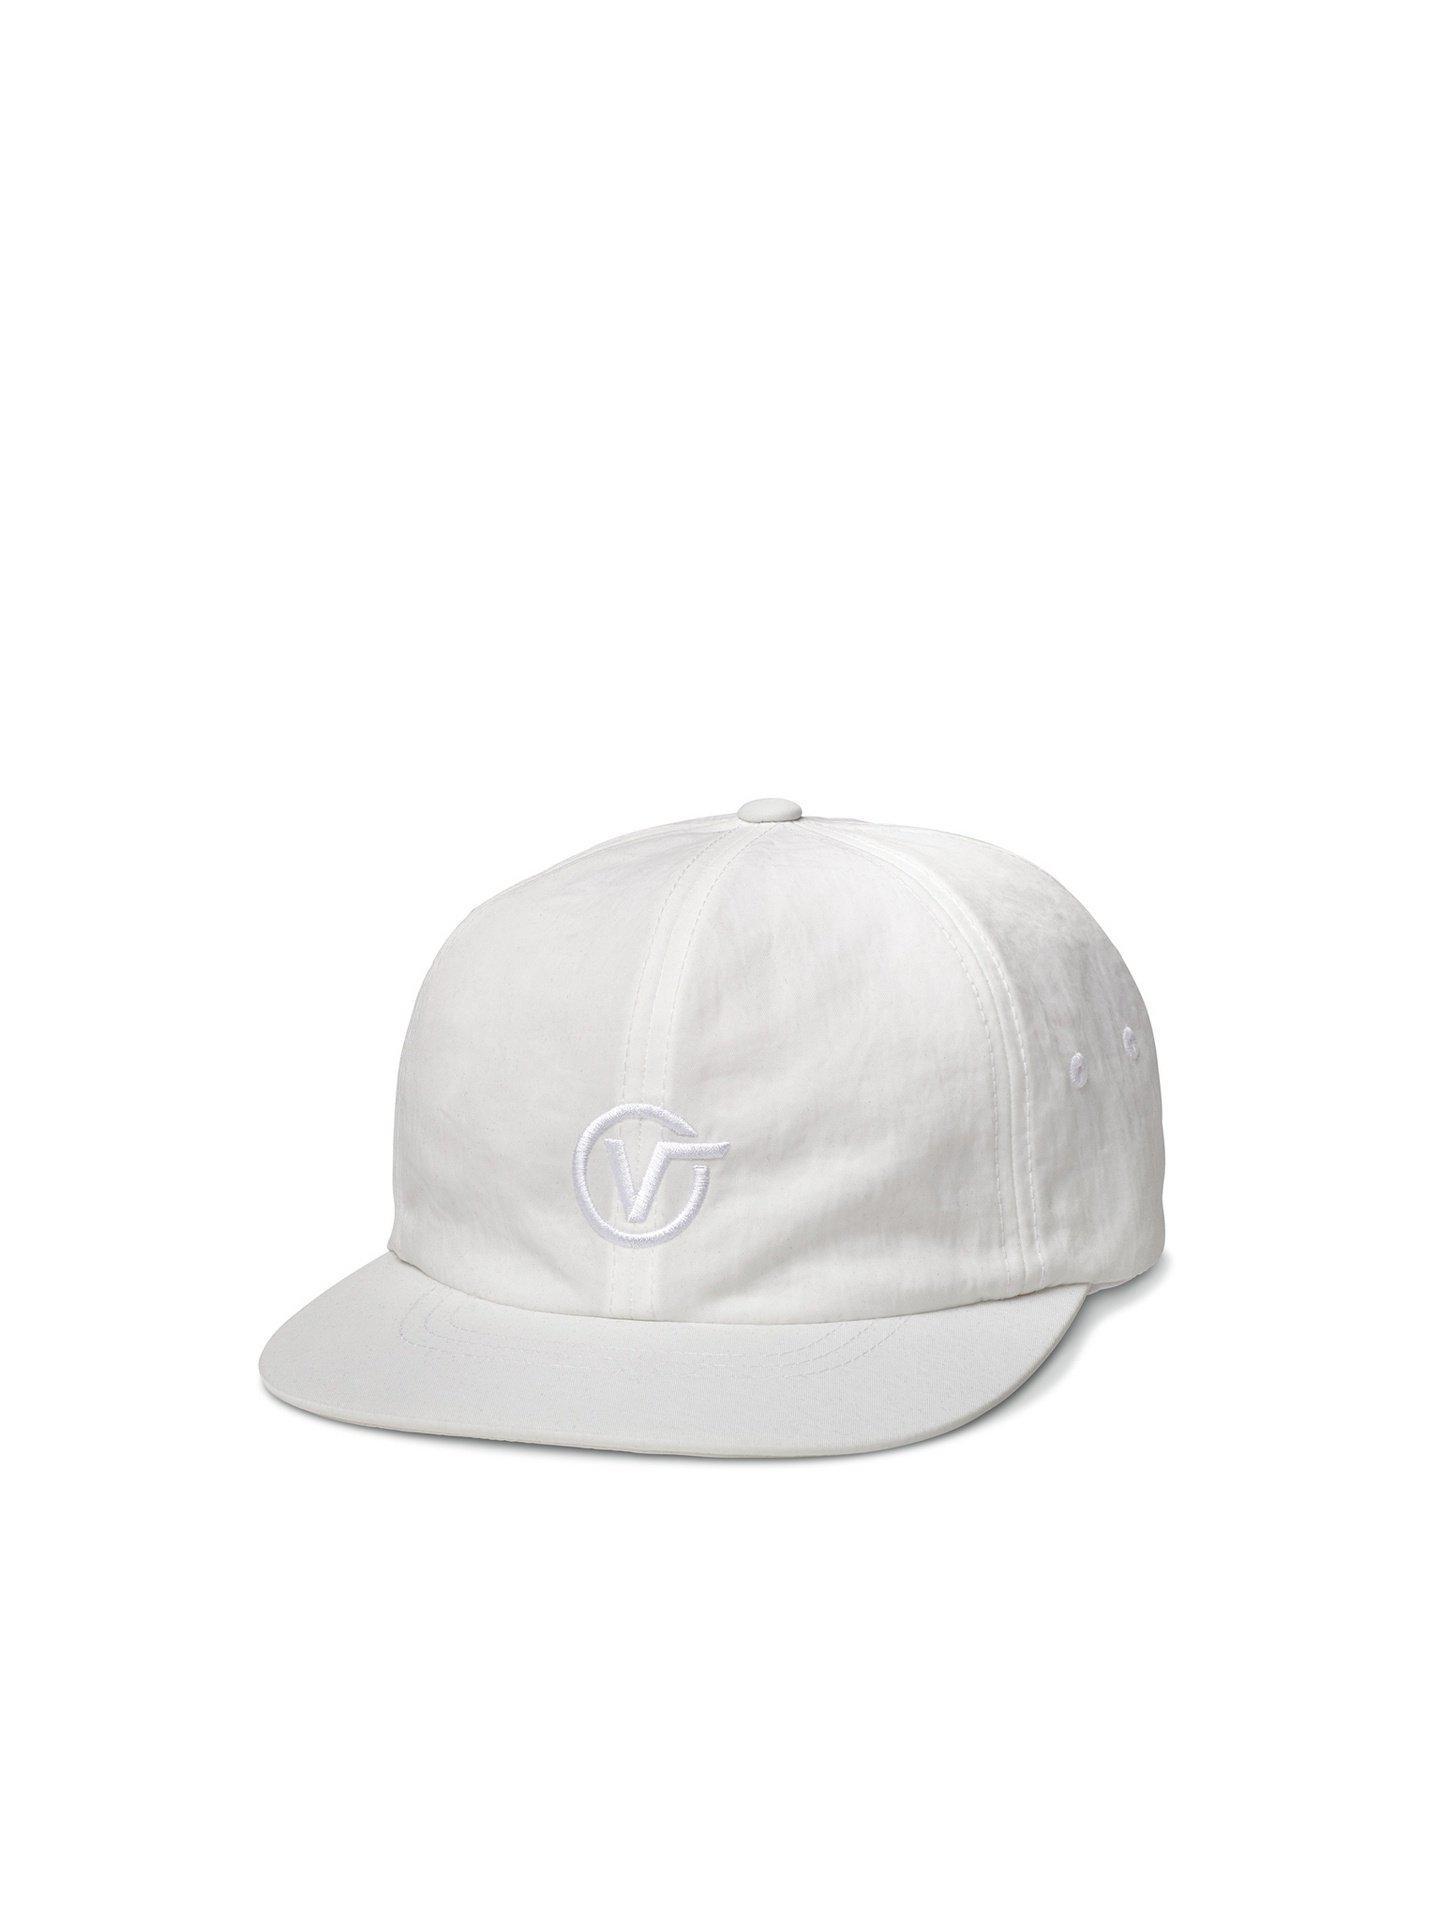 Lyst - Vans Vans X Lqqk Studio Hat in White for Men 65569e83c